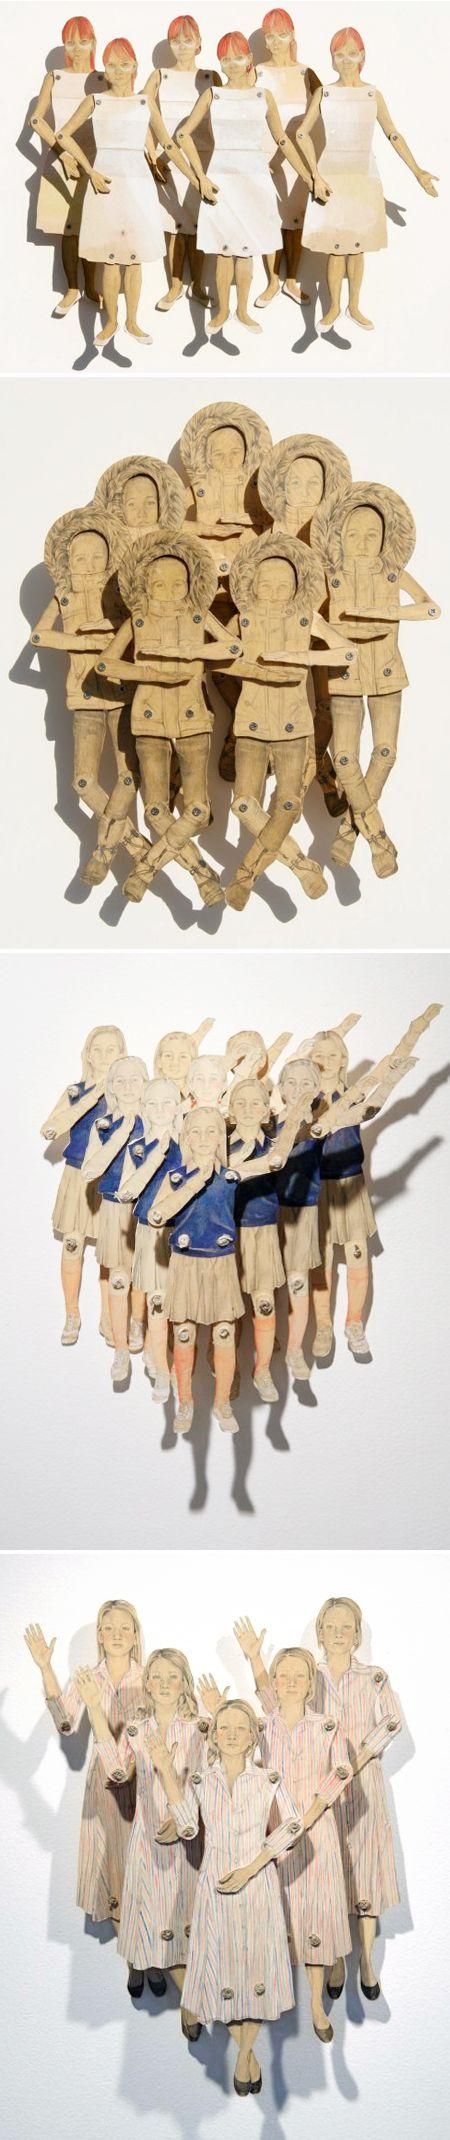 Claire oswalt loutky pinterest kunstunterricht for Stuhl design kunstunterricht